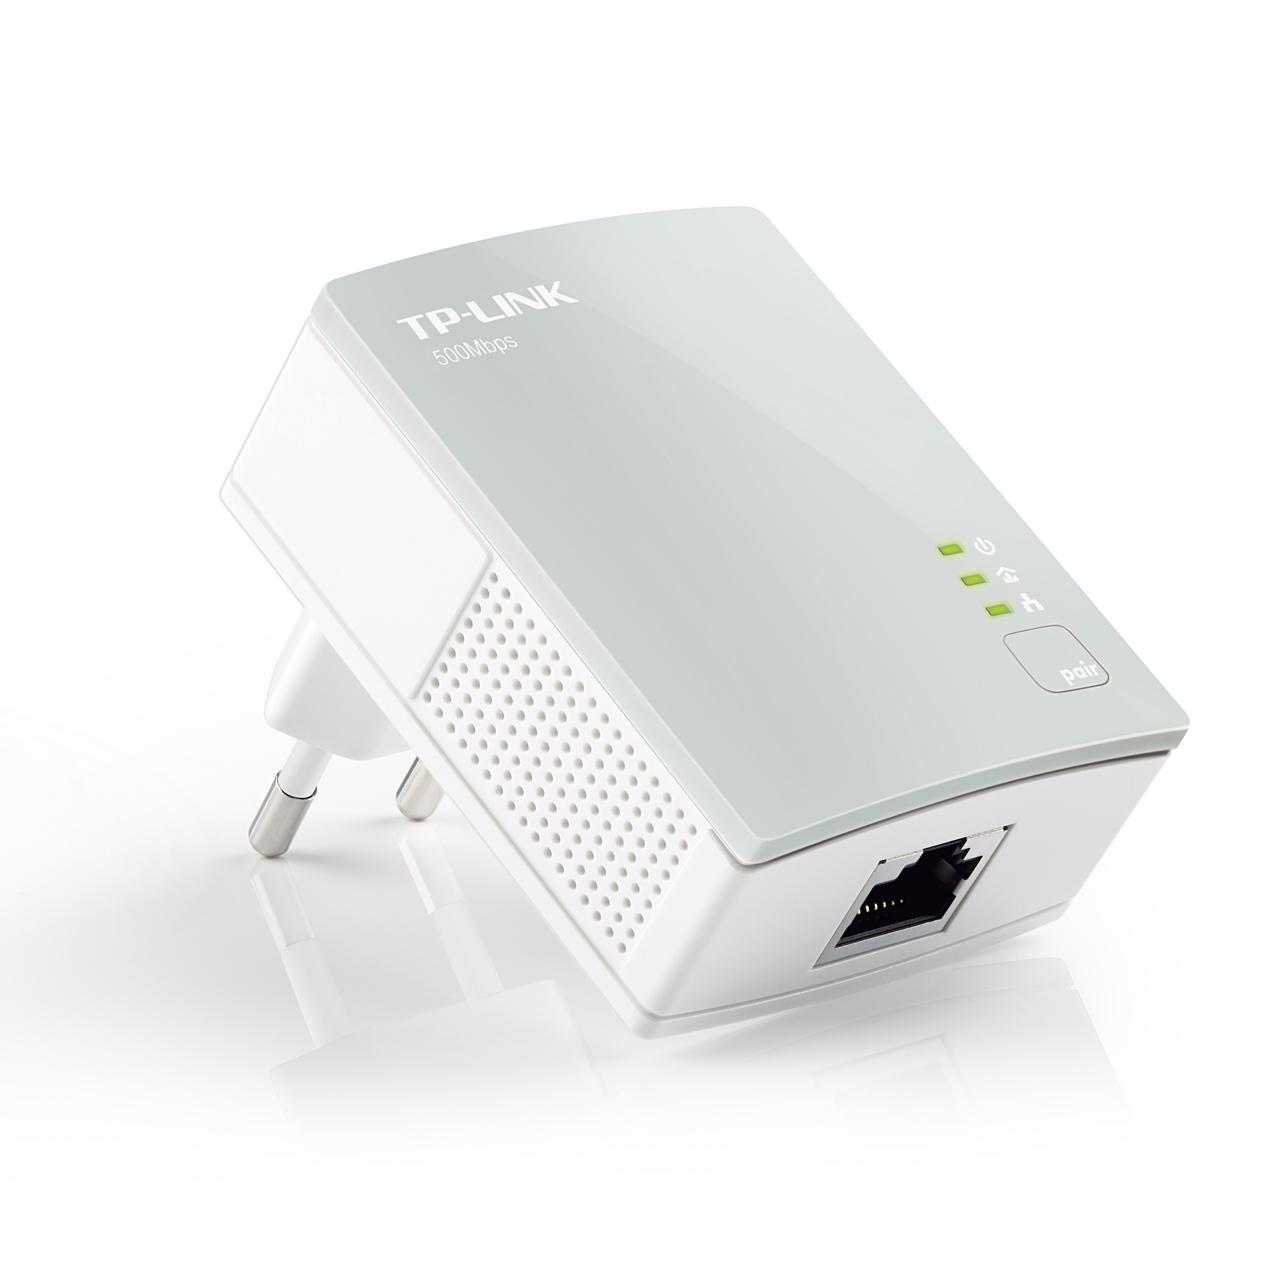 tp link tl pa4010 av500 nano powerline adapter lisconet. Black Bedroom Furniture Sets. Home Design Ideas